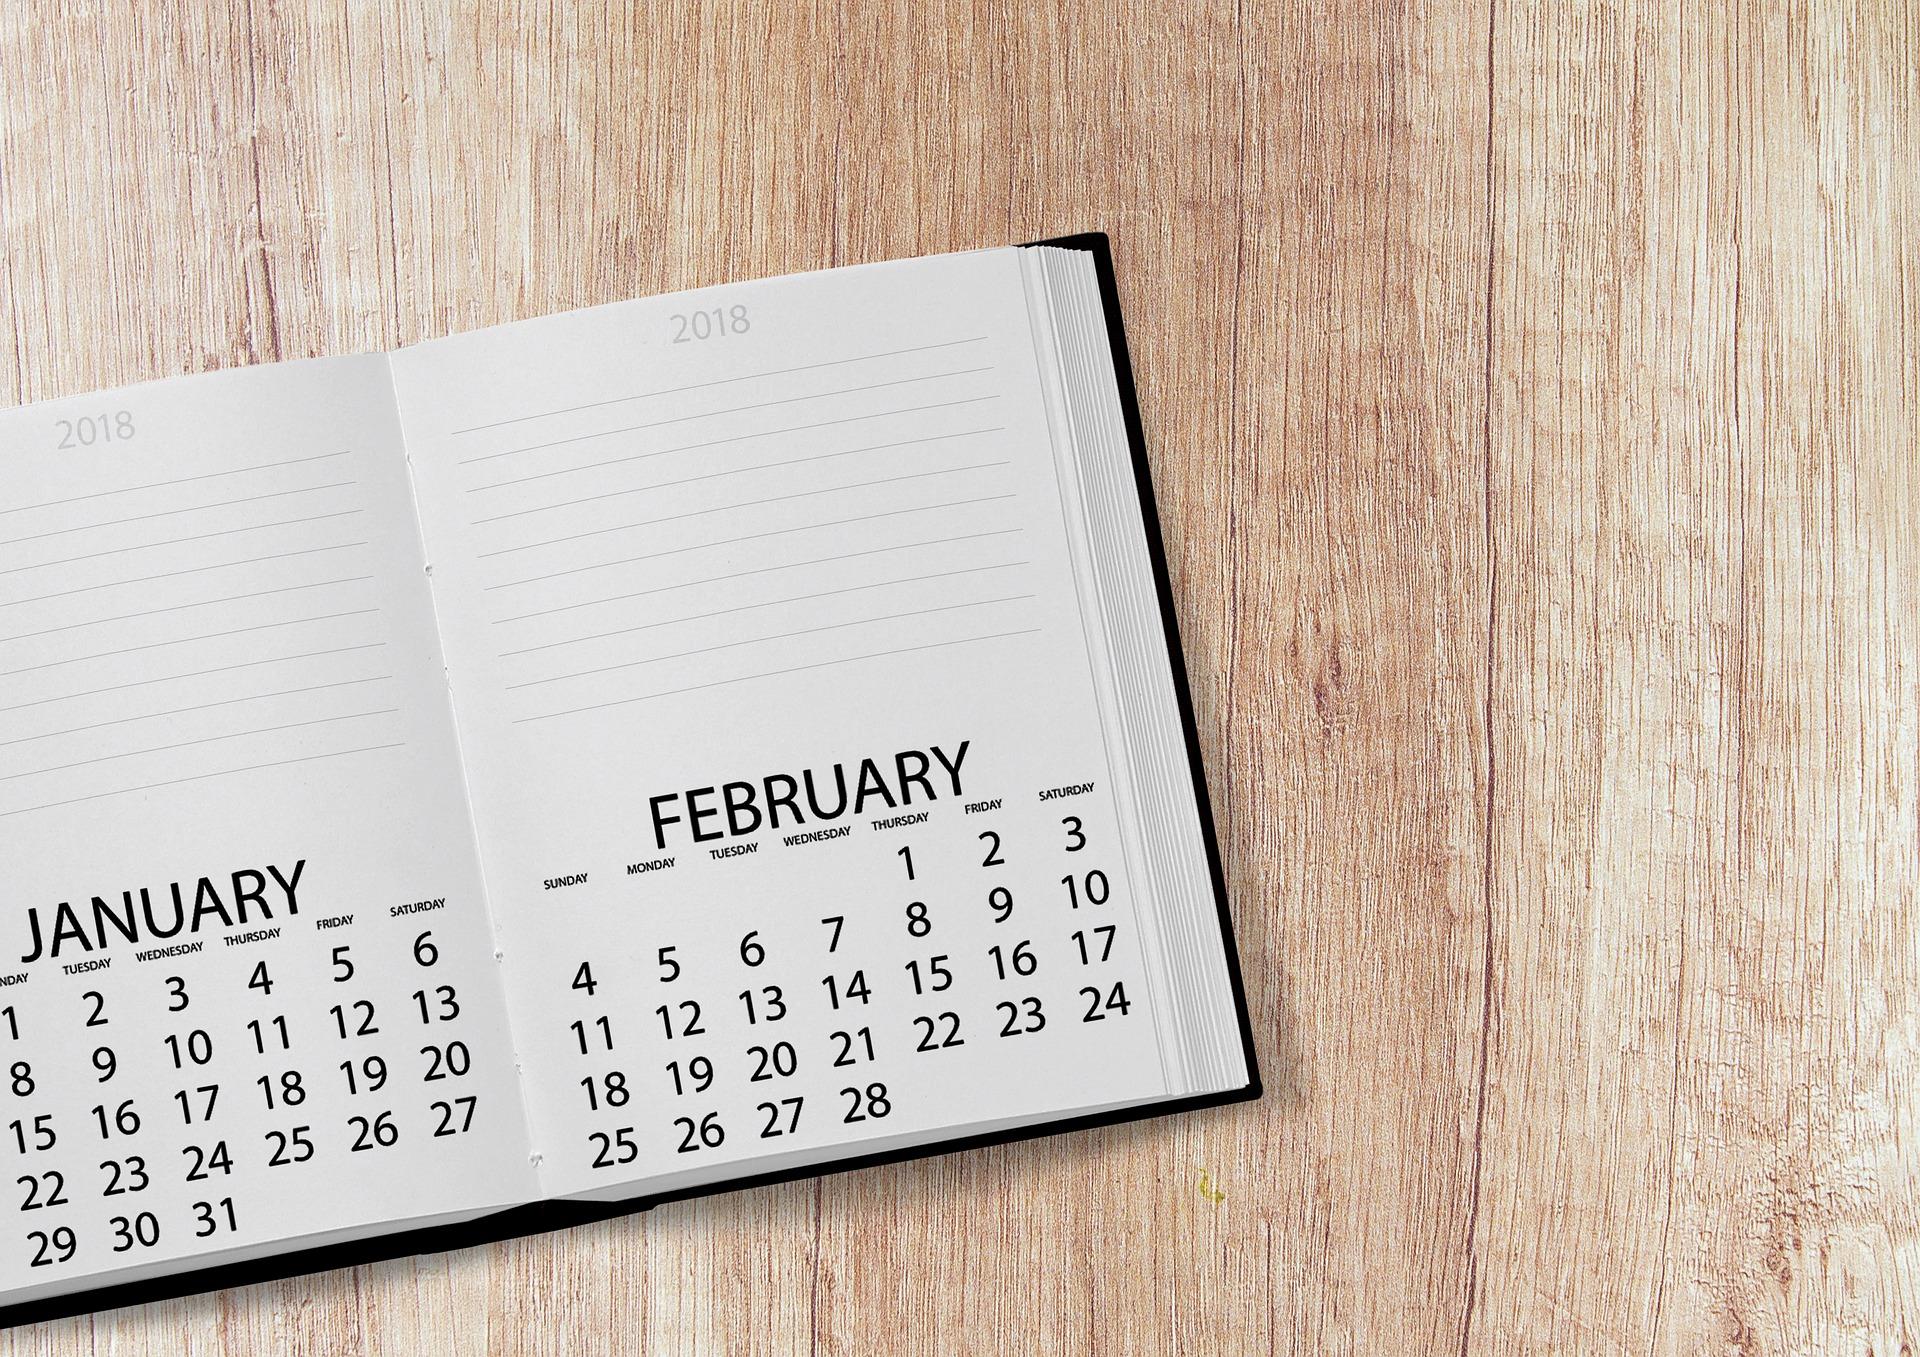 Calendar open to February